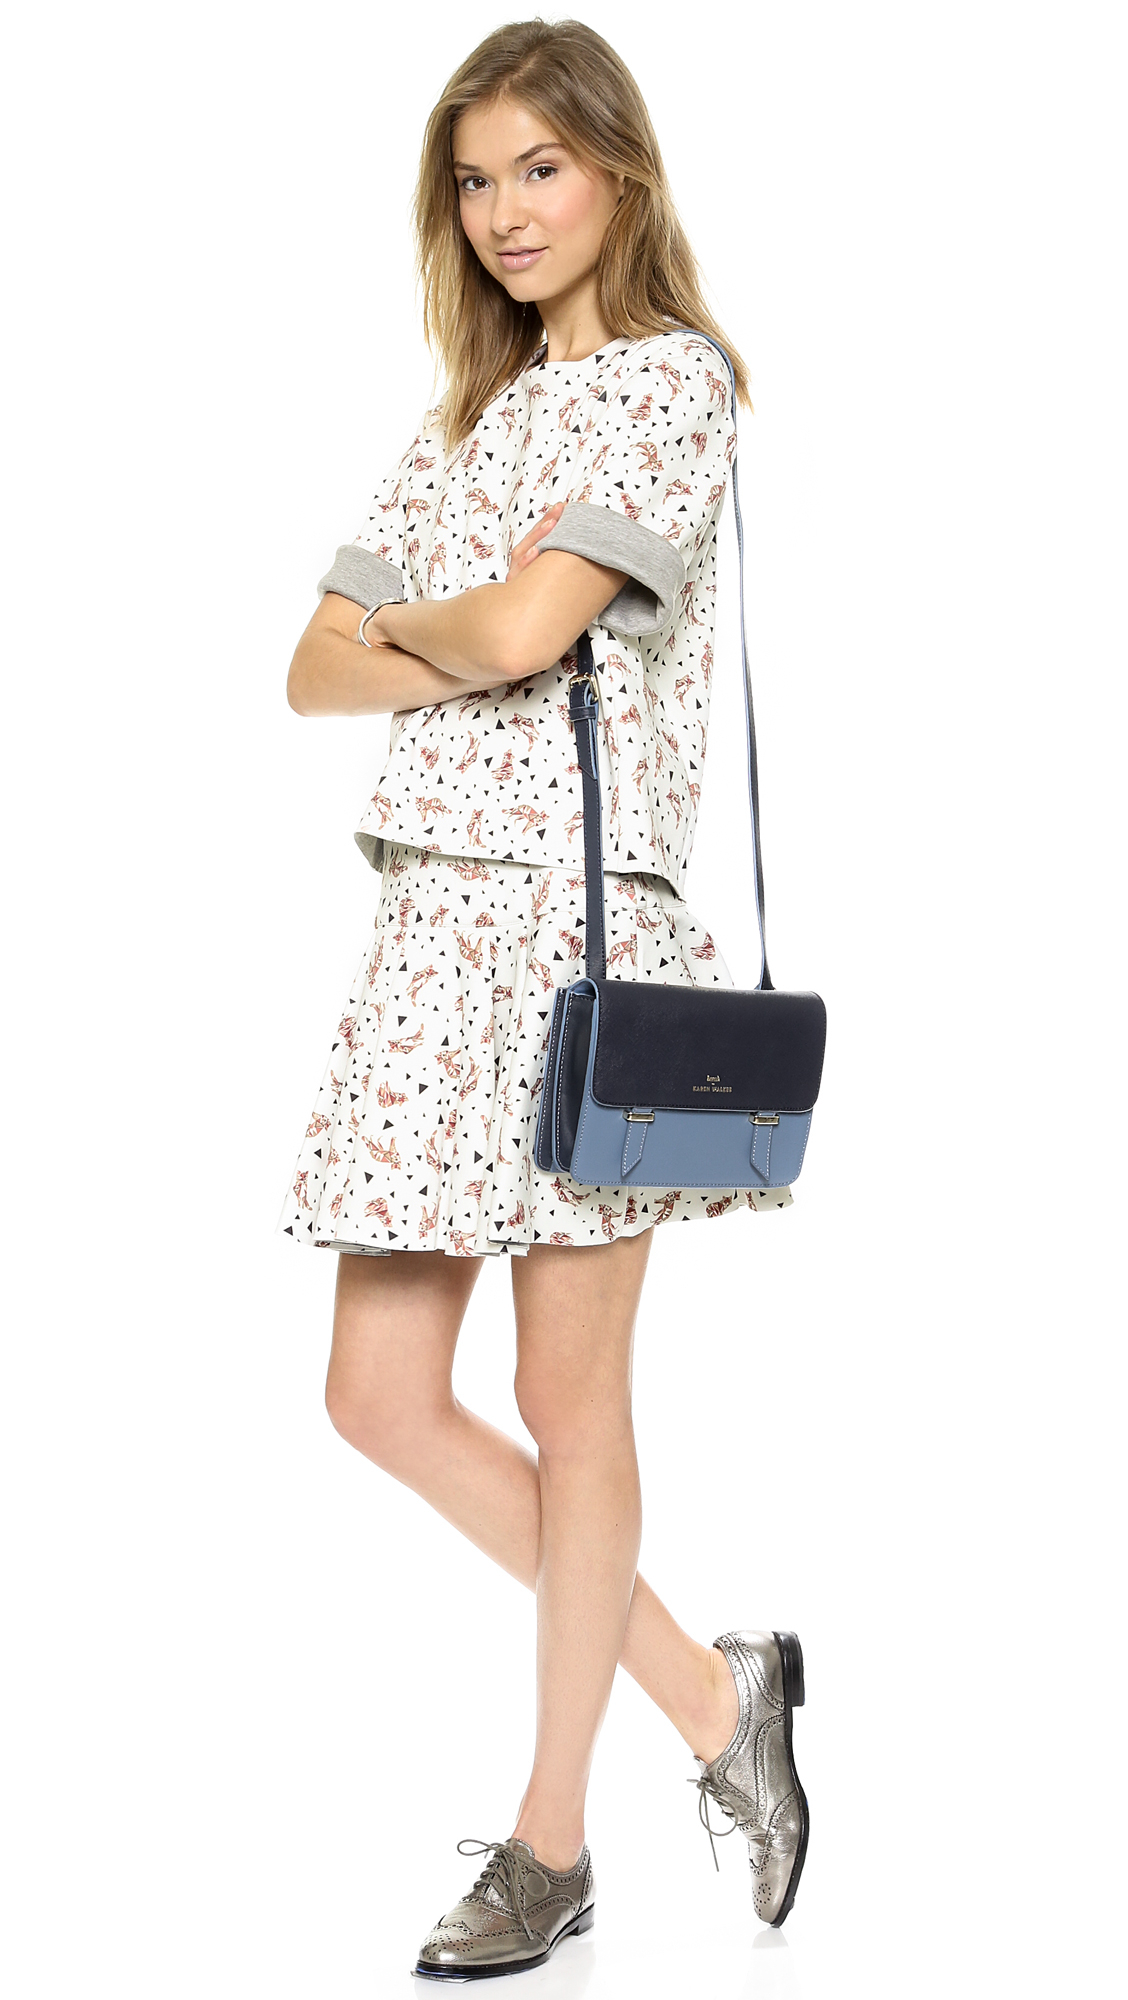 c3f7365139c Karen Walker Sloane Cross Body Bag Bluemidnight in Blue - Lyst